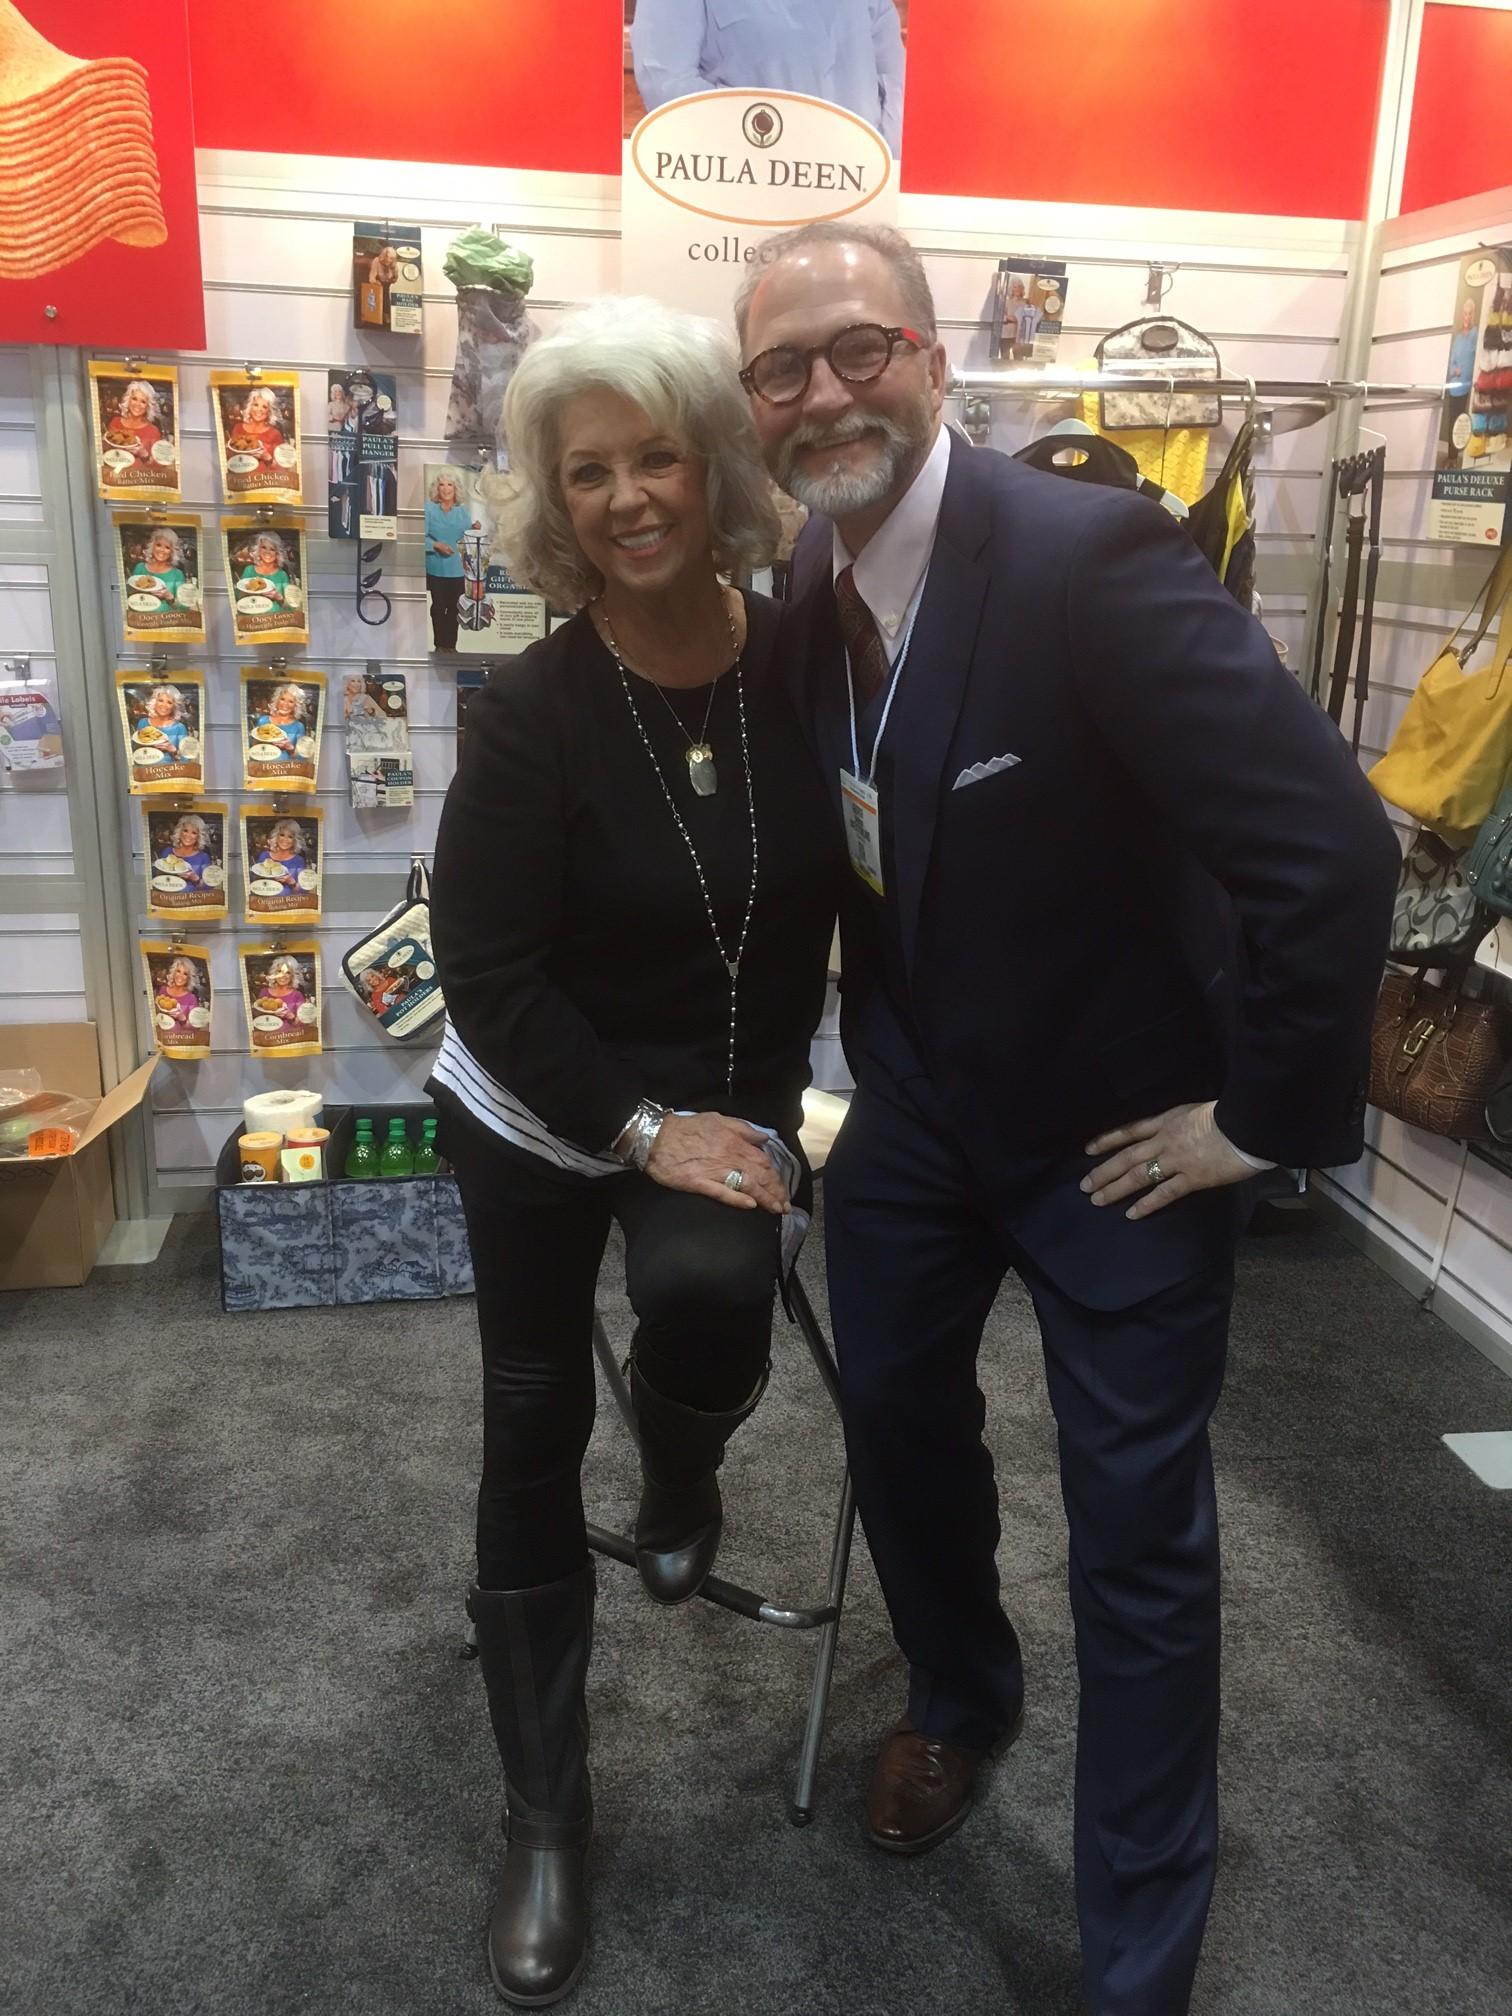 Paula Deen and George Davison - IHHS 2016